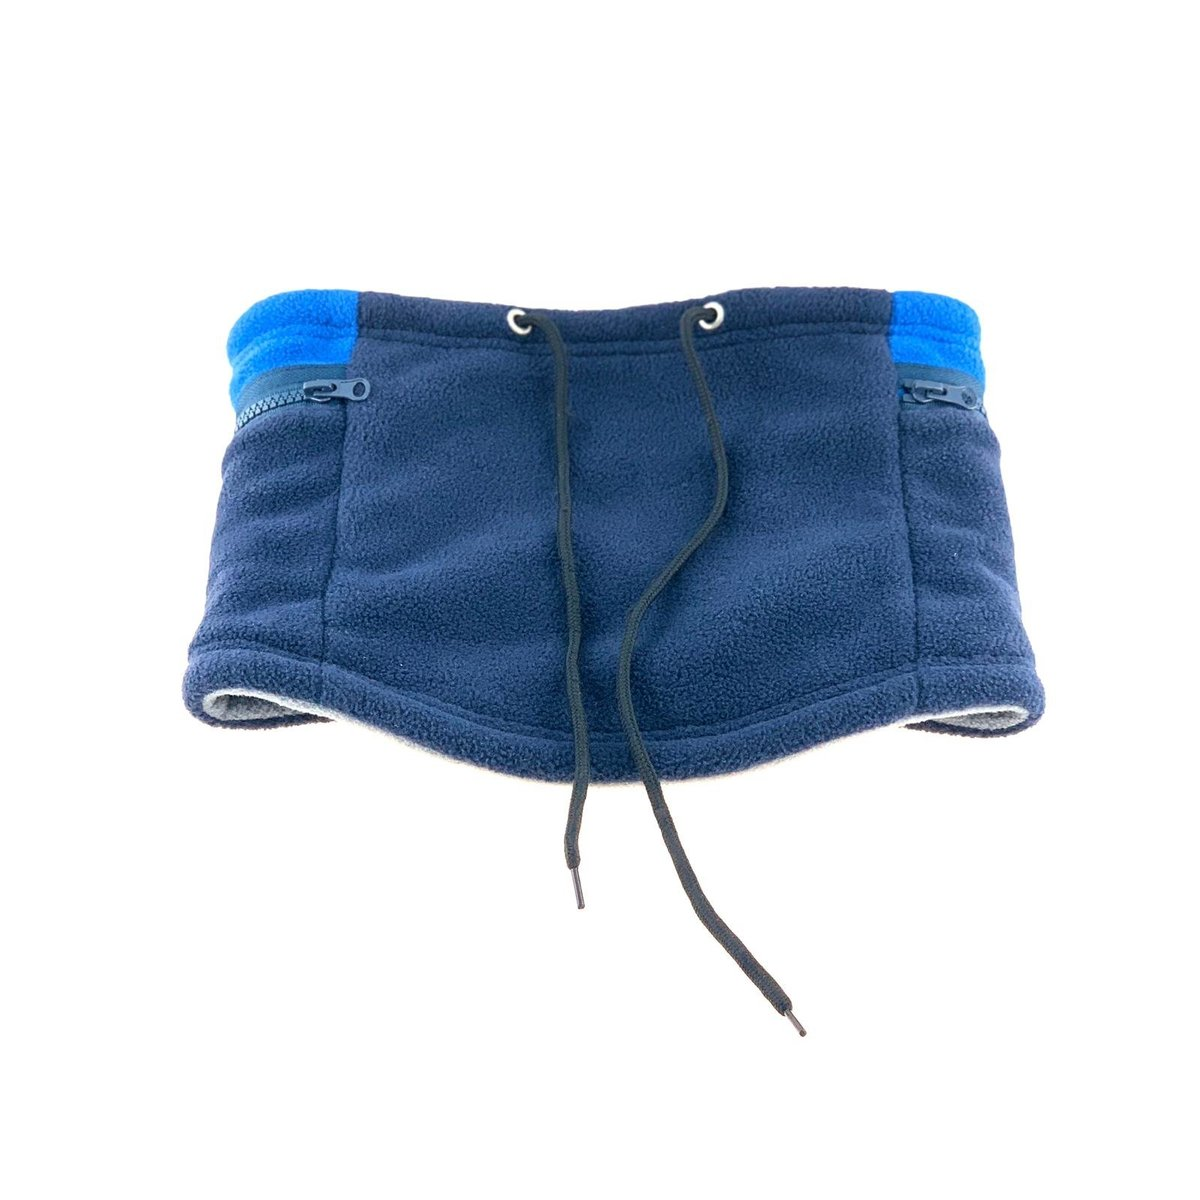 Travel Fleece Neck Warmer with pocket